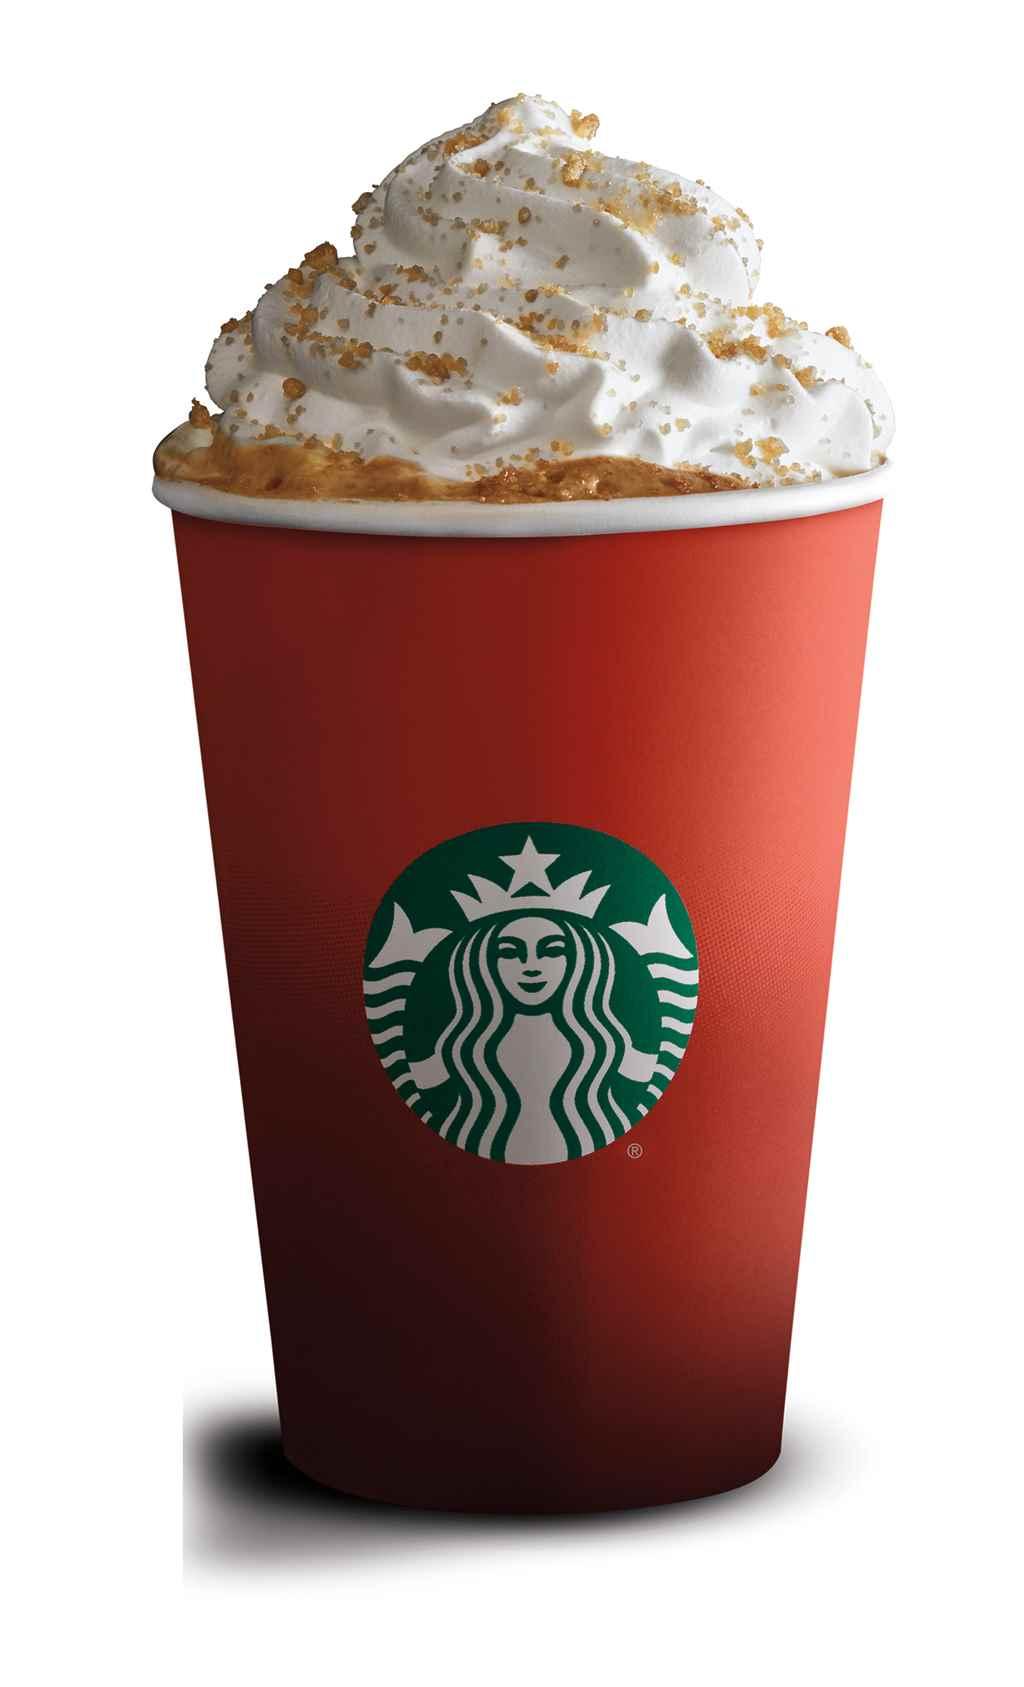 Starbucks_ToffeeNut Latte